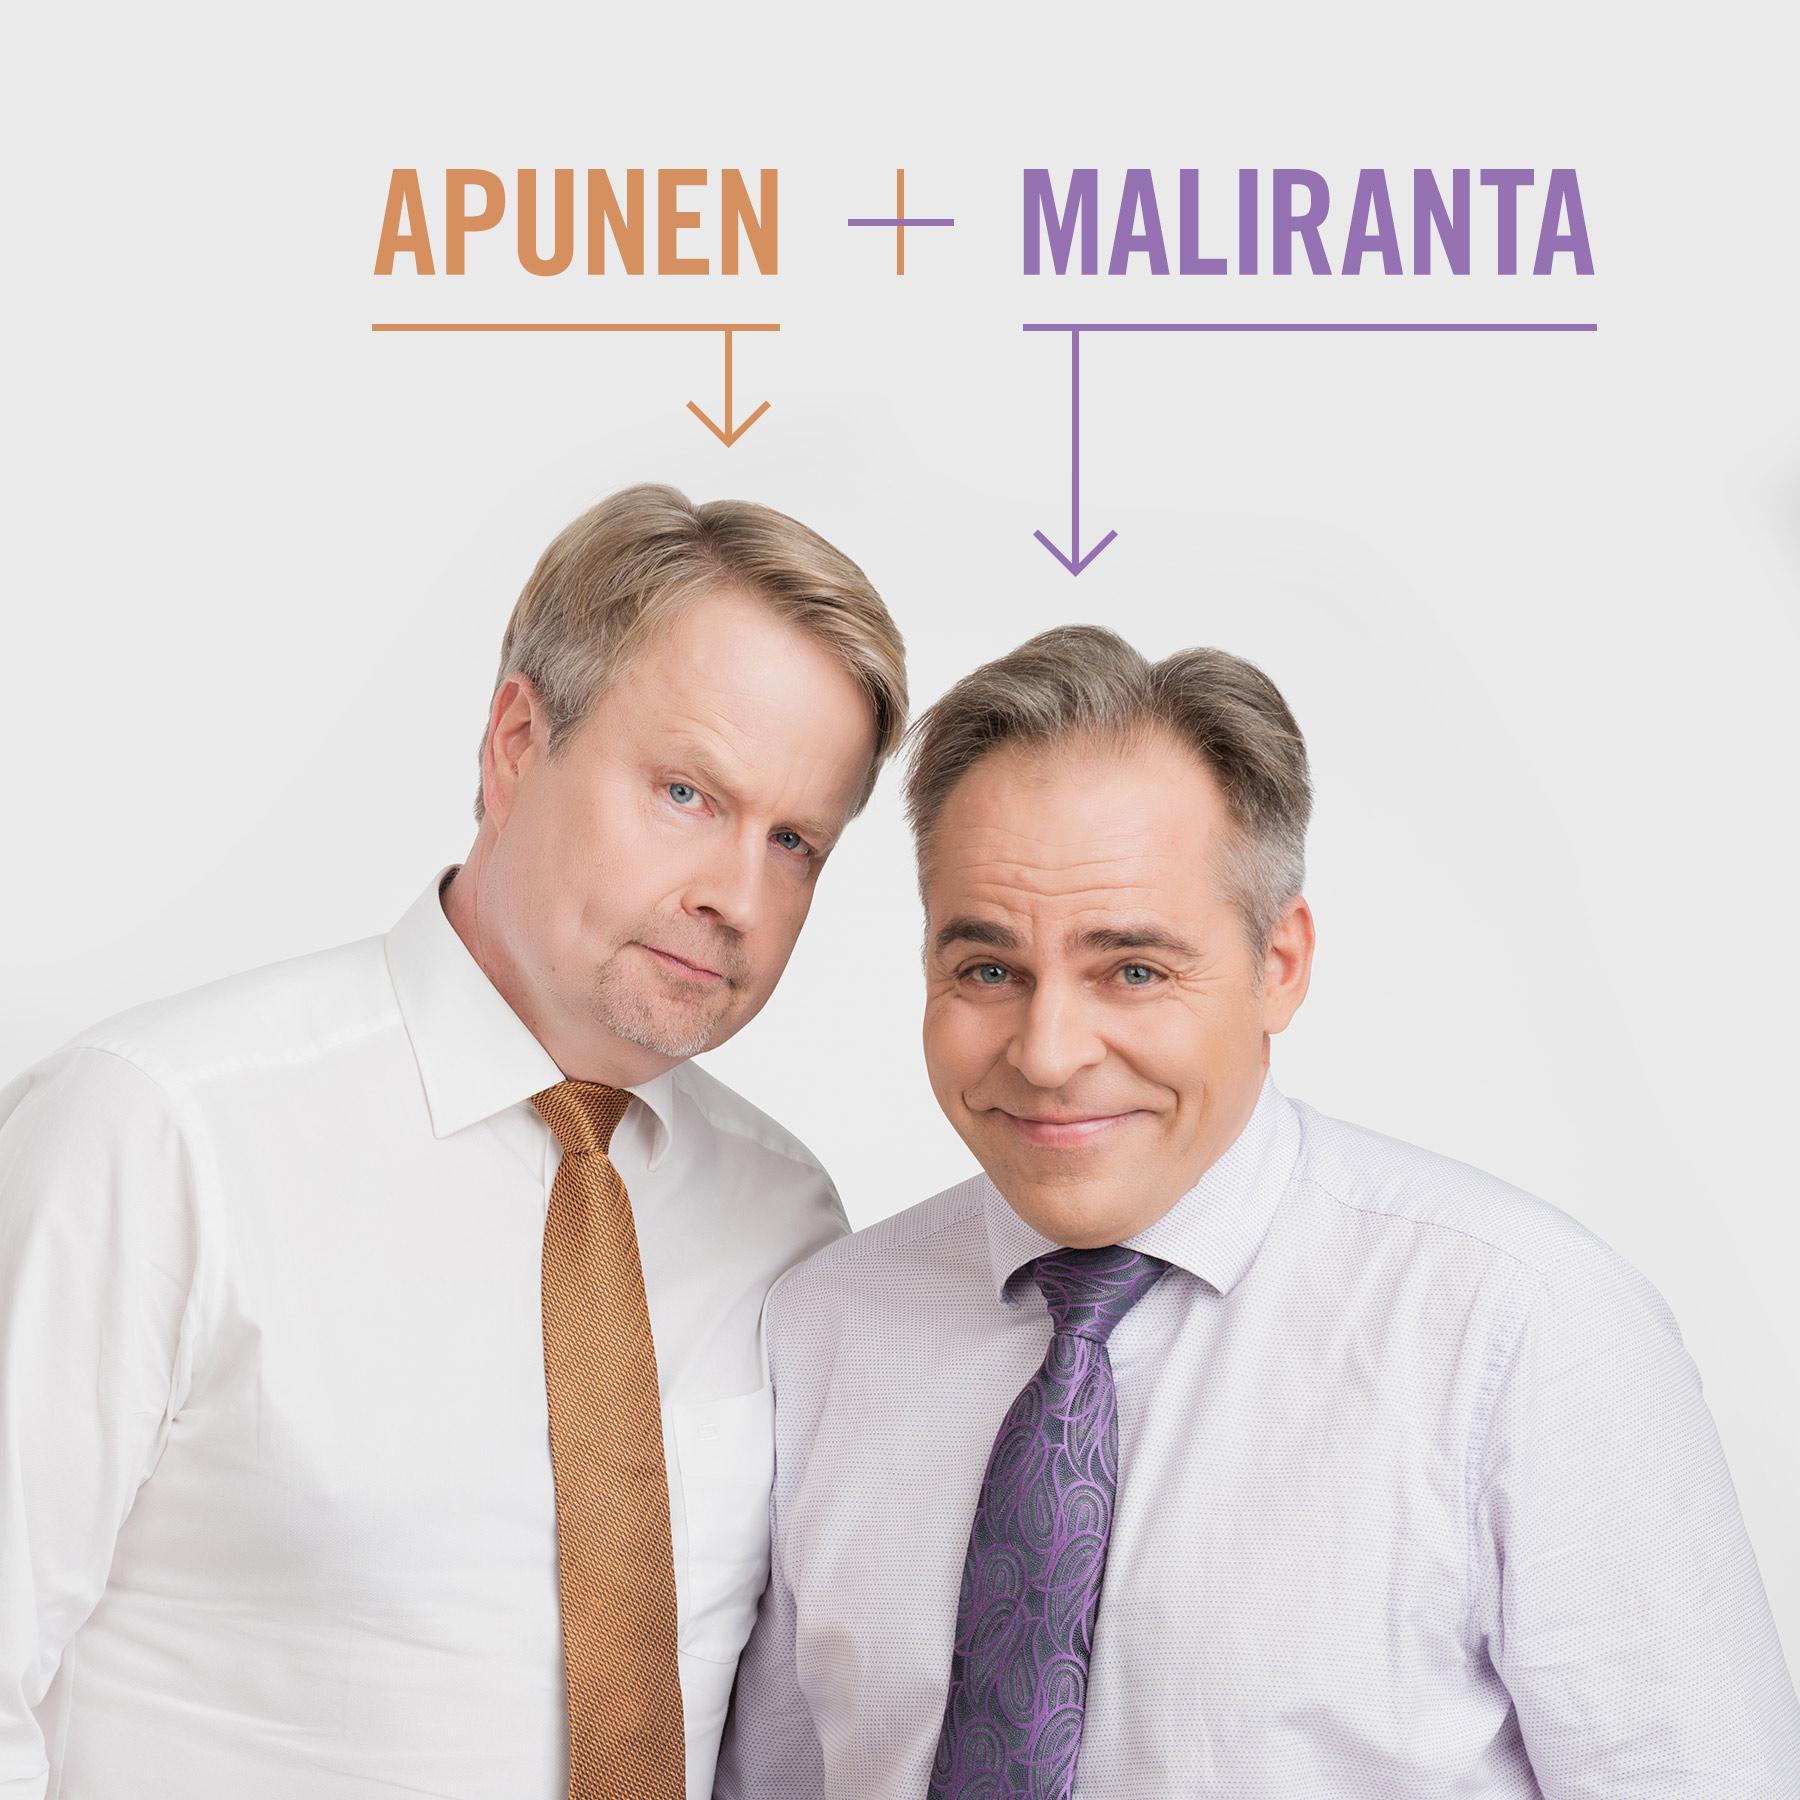 Apunen/Maliranta